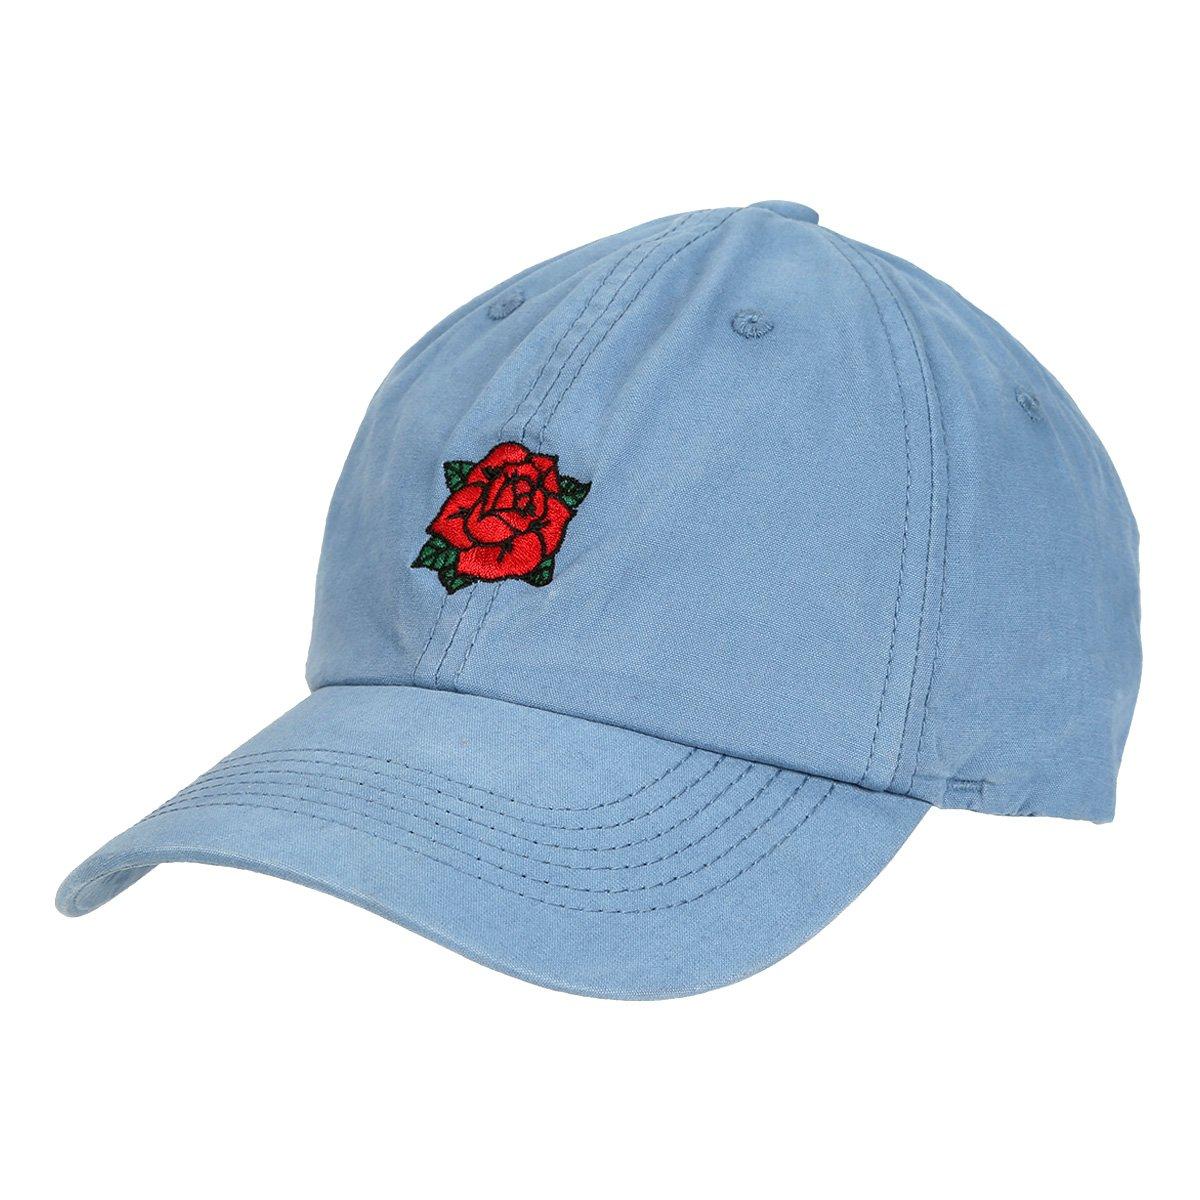 Boné Mood Aba Curva Rosa Masculino - Compre Agora  14cdd19d6f8